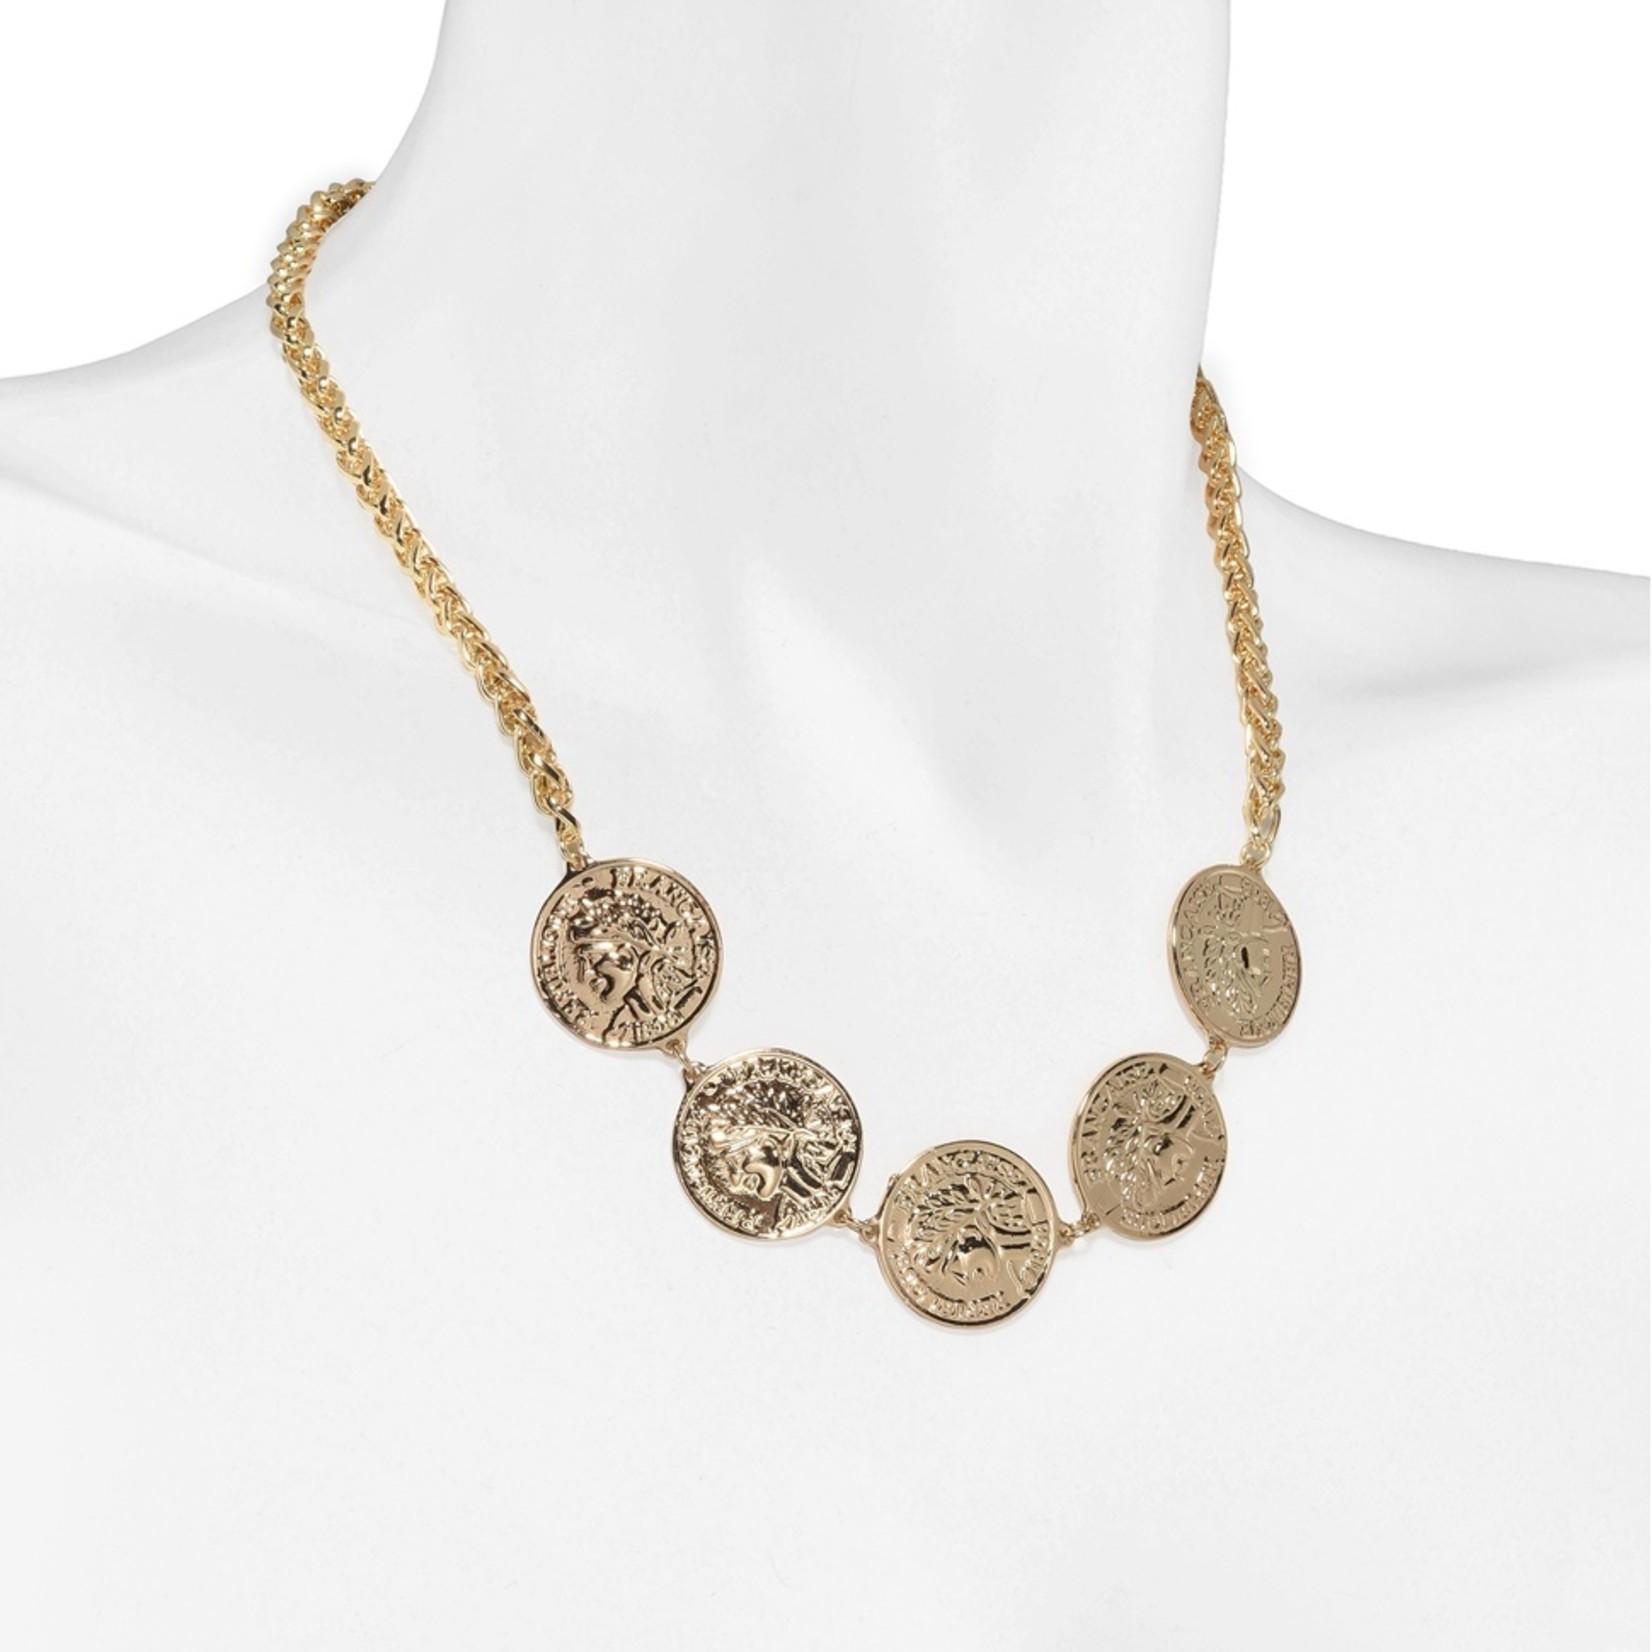 Piemonte ketting goudkleurig met munten